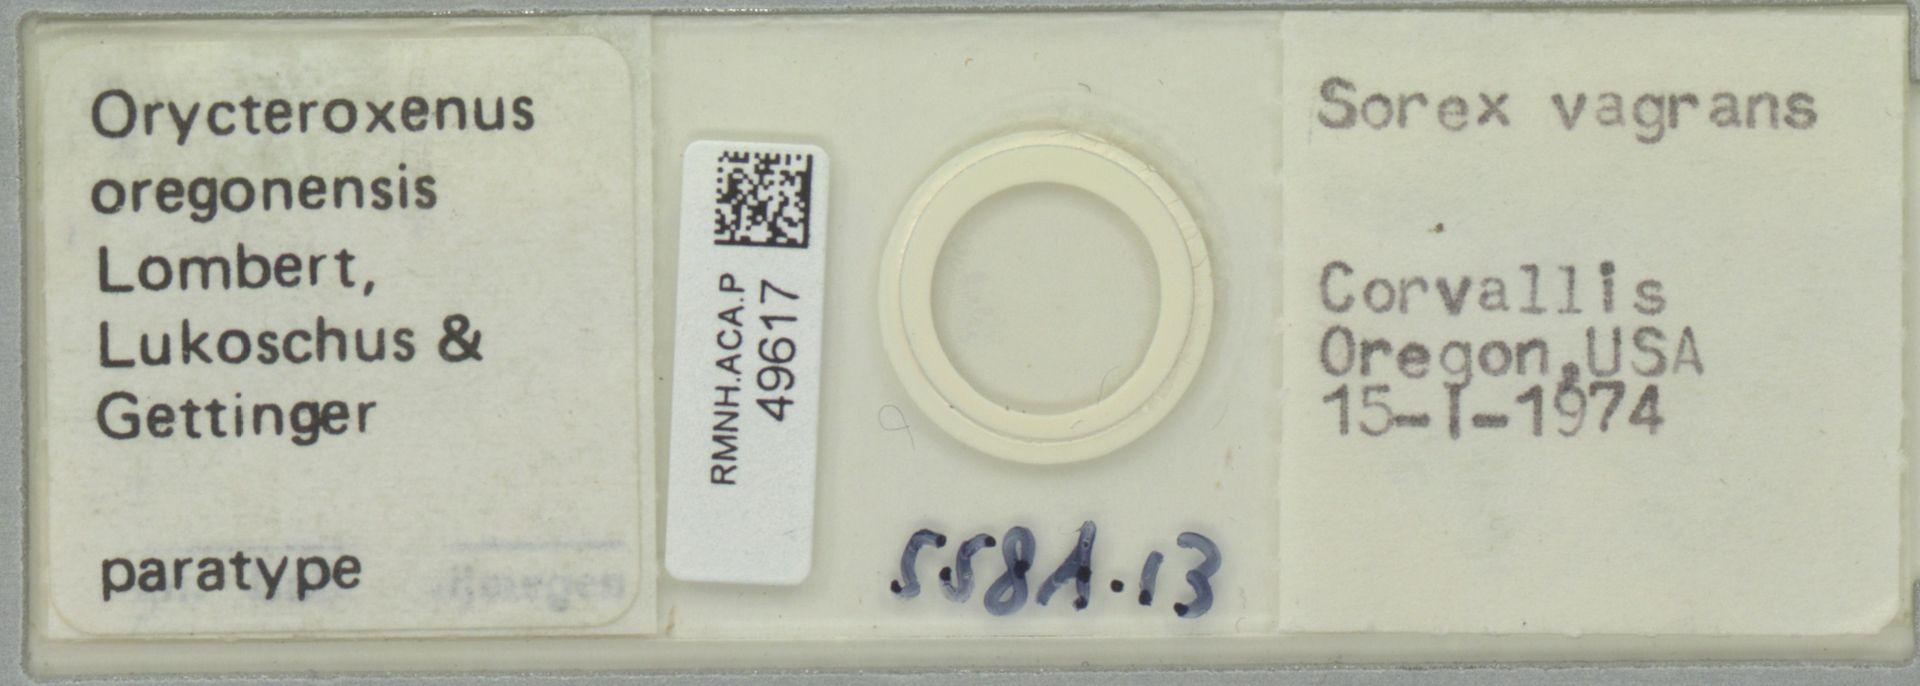 RMNH.ACA.P.49617 | Orycteroxenus oregonensis Lombert, Lukoschus & Gettinger